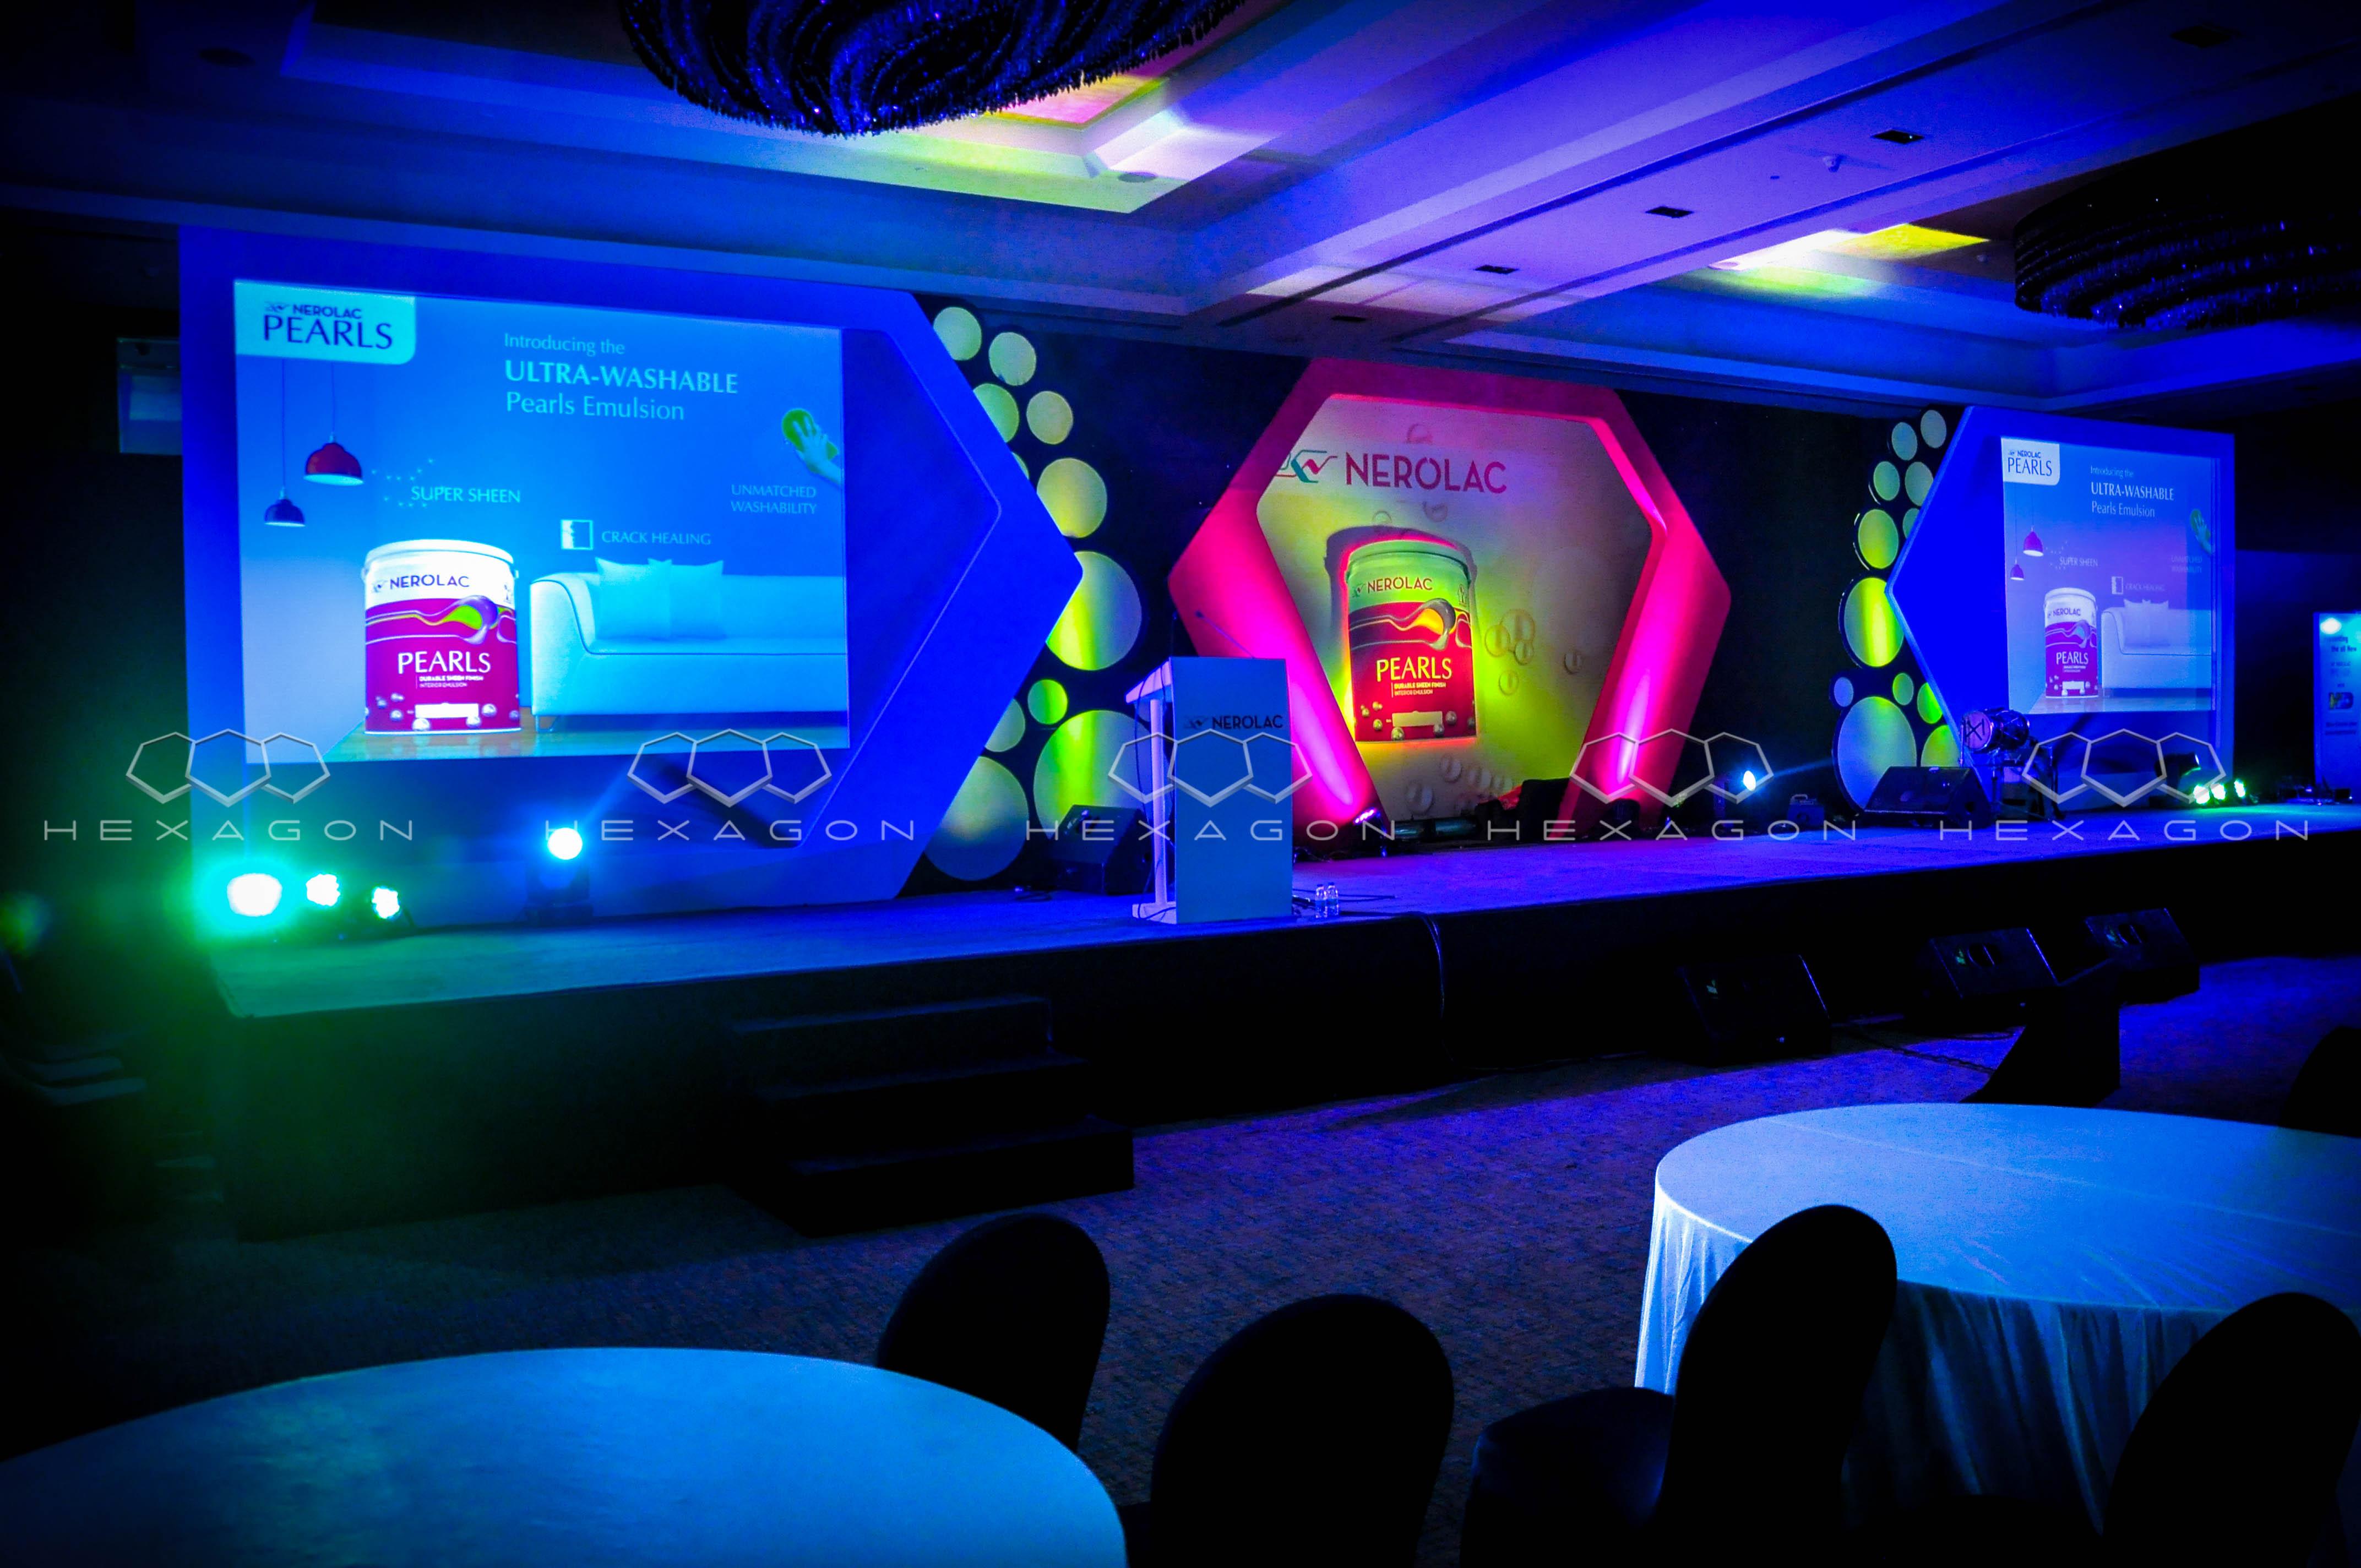 Hexagon Events Manages Kansai Nerolac's 3-City Dealers' Meet With Rituparna, Huma & Lauren